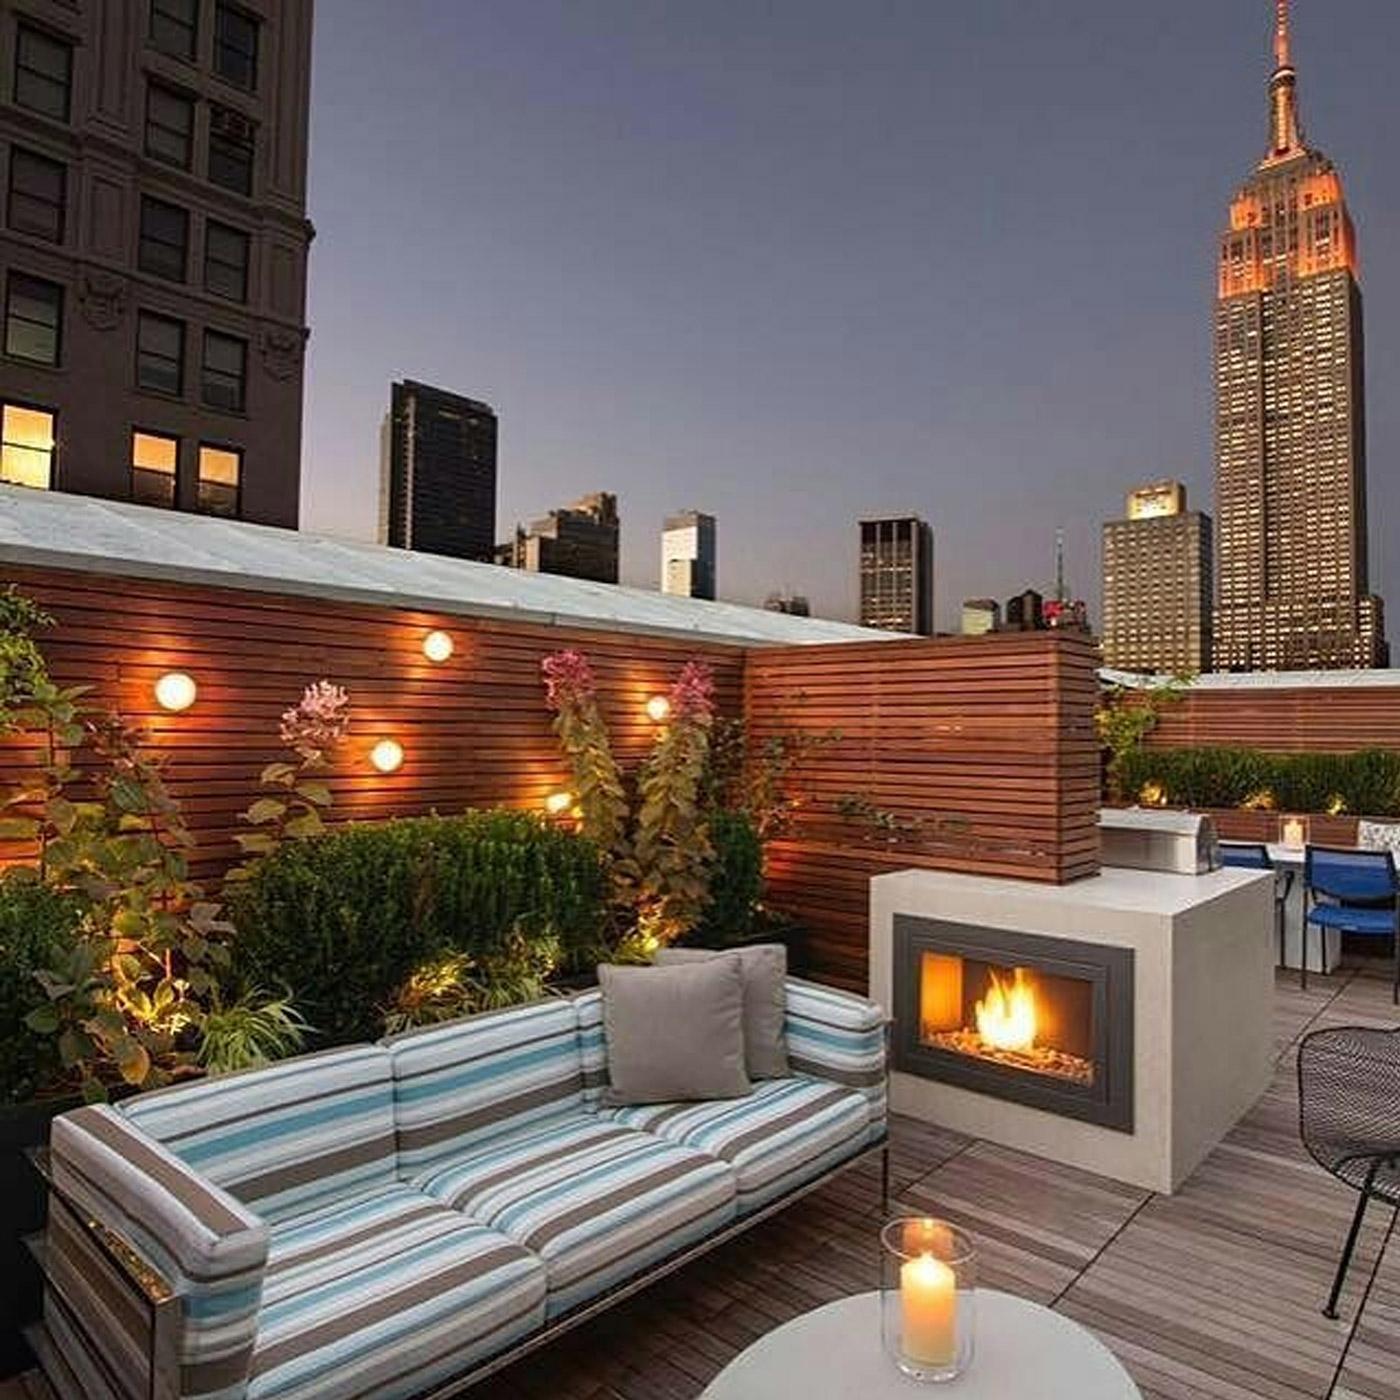 striped brown jordan sofa in NYC rooftop garden